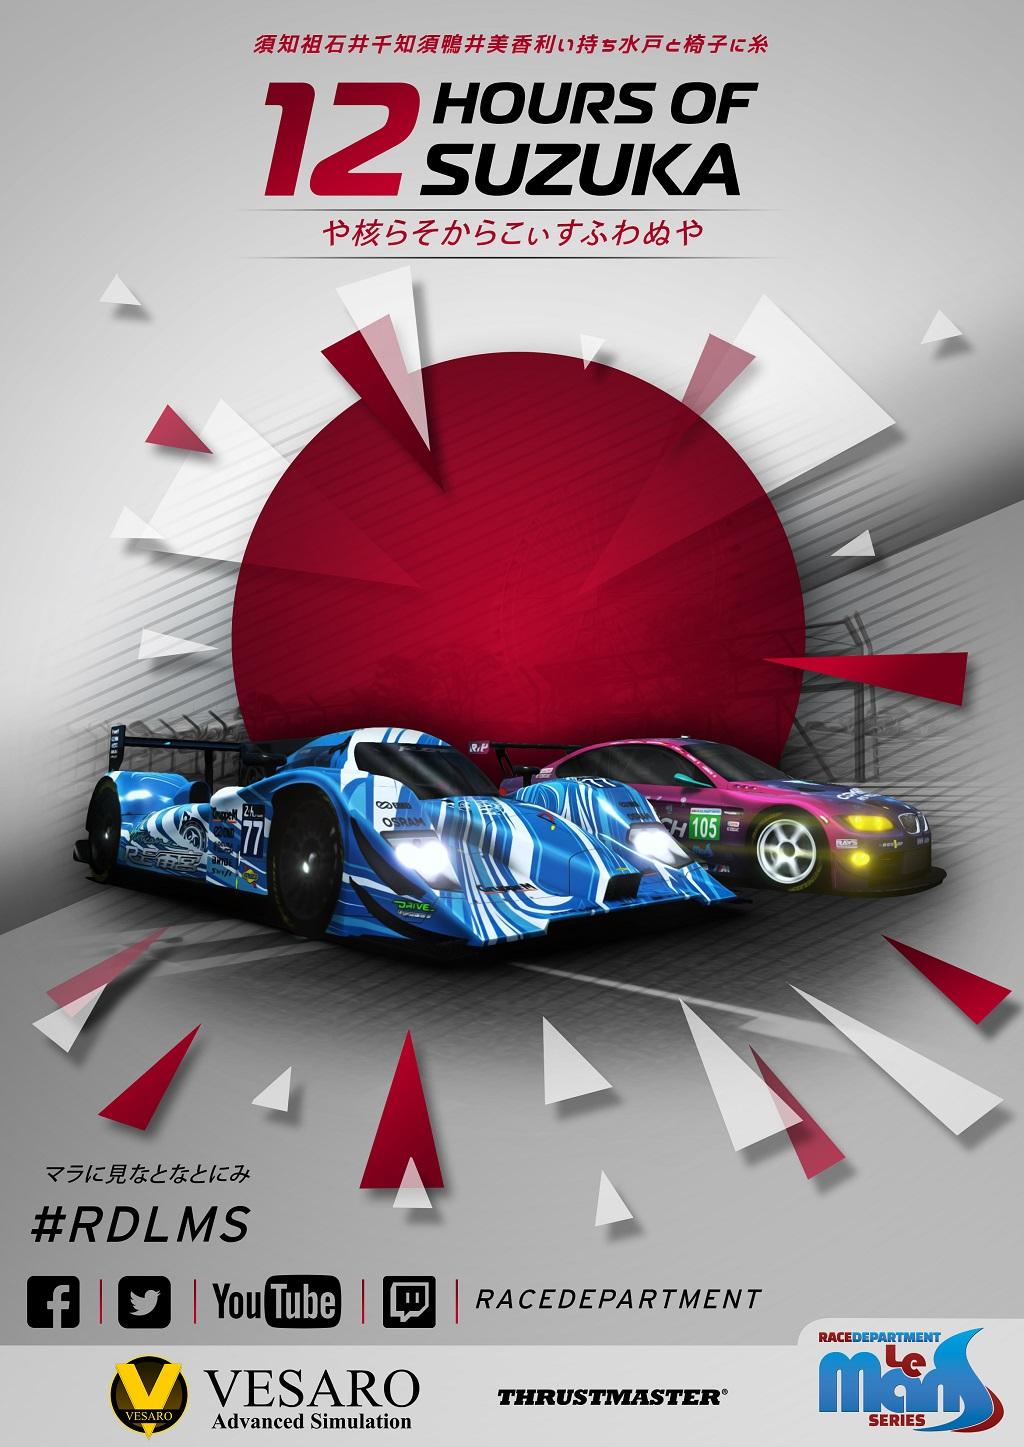 RDLMS Suzuka Poster ALT.jpg